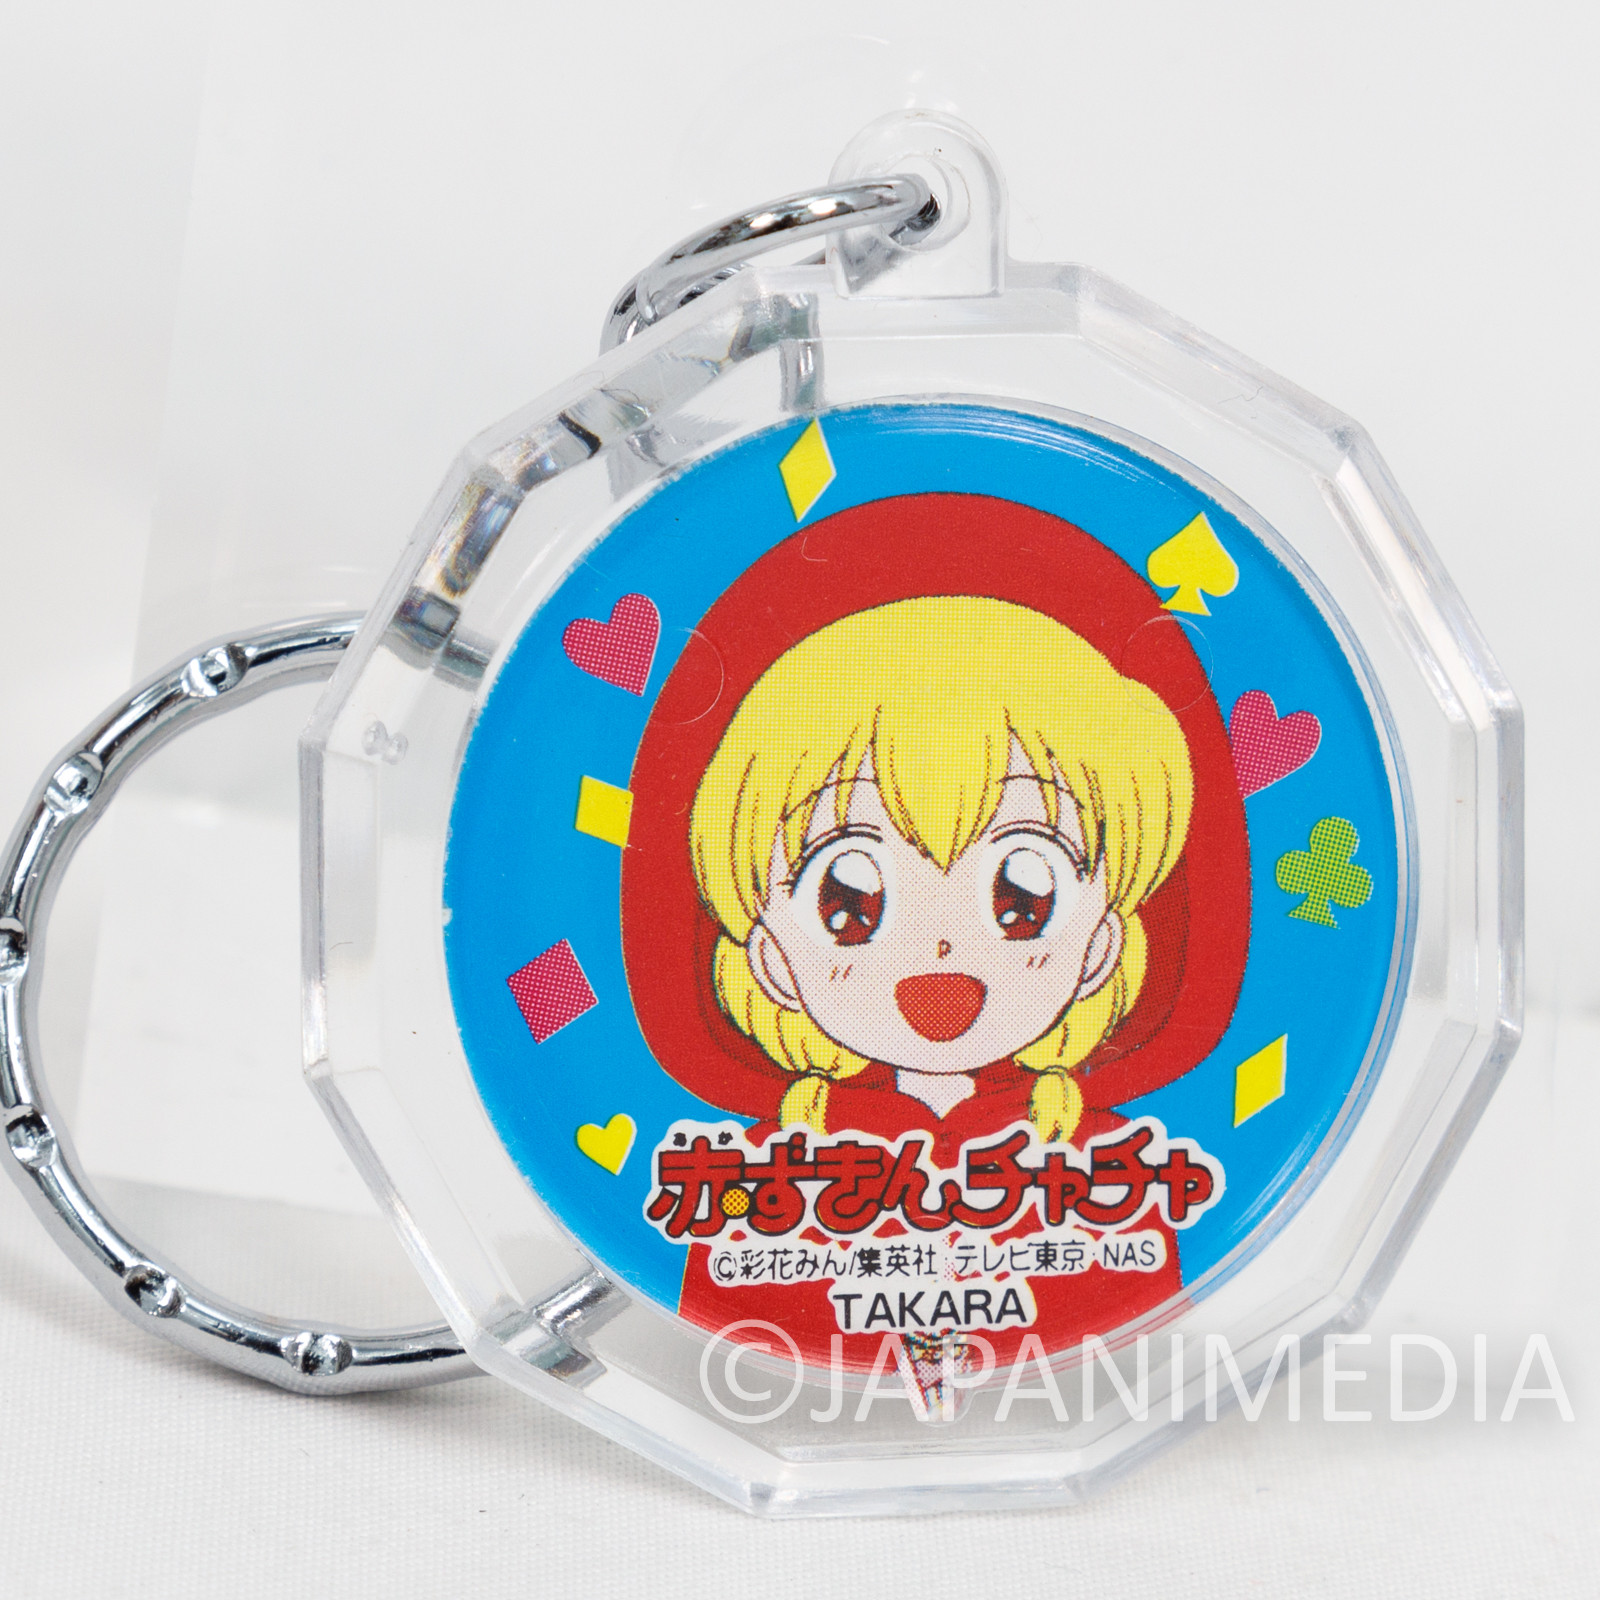 Akazukin Chacha Acrylic Charm Keychain JAPAN ANIME